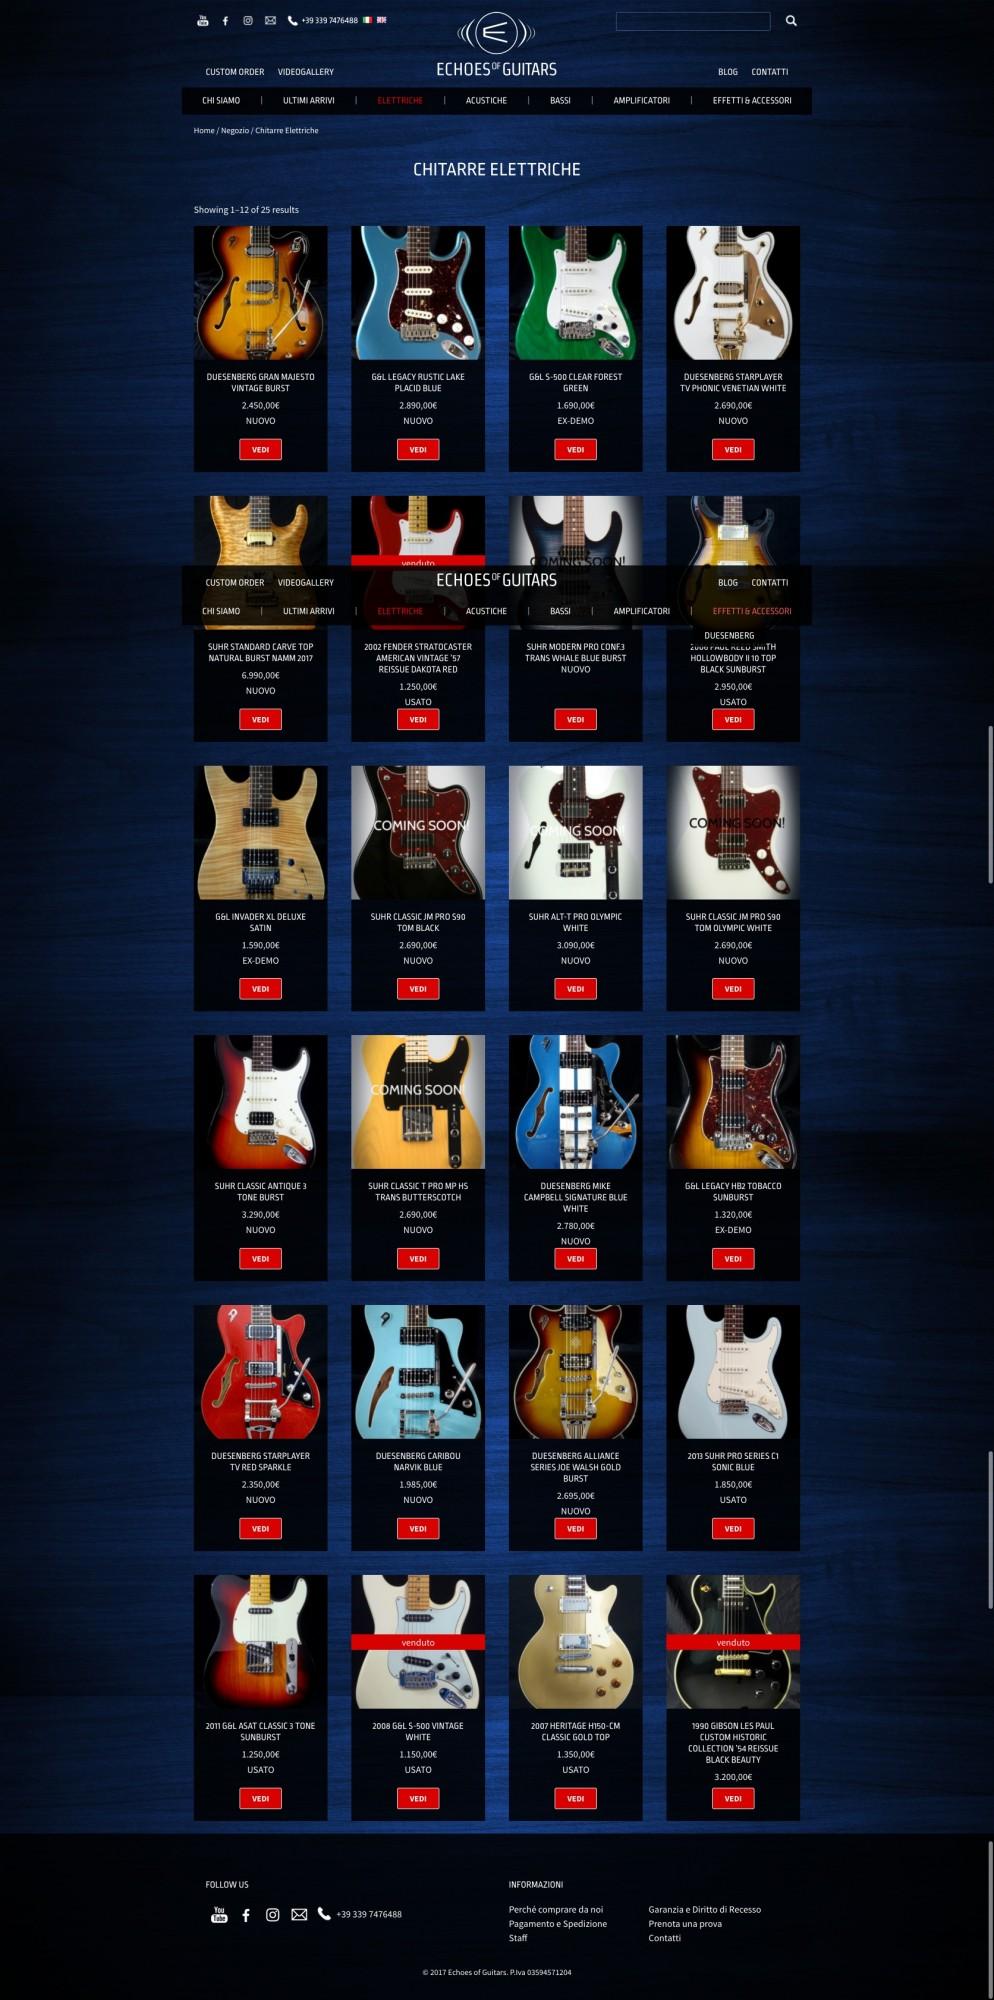 Studio Youtool sezione chitarre Echoes of Guitars